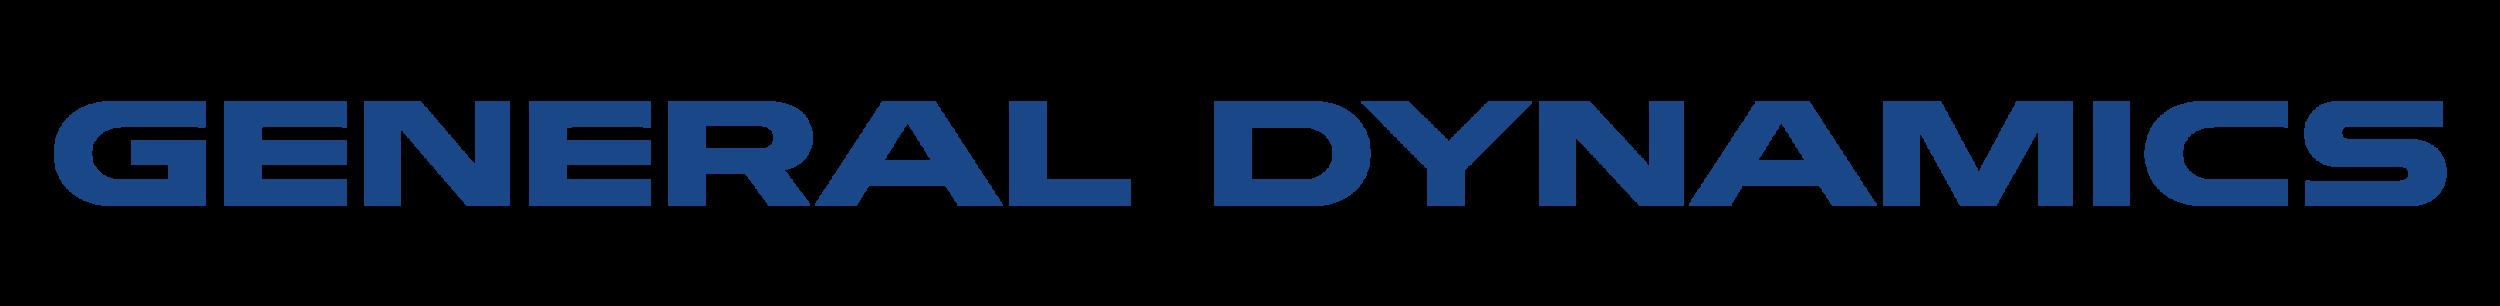 General-Dynamics-Logo-PNG-Transparent.png